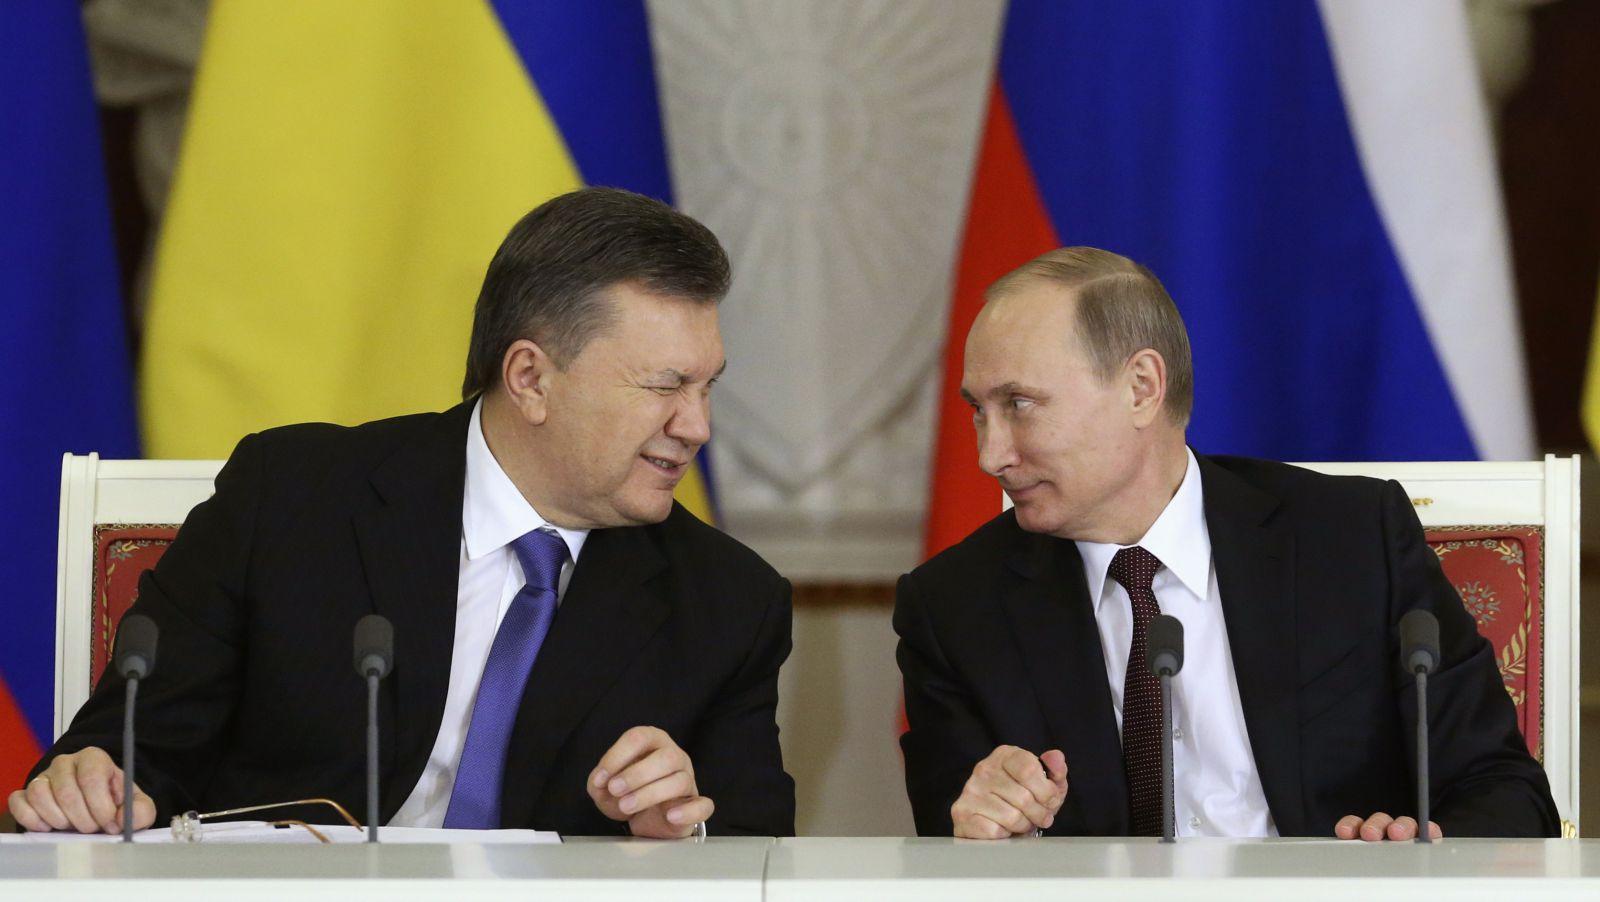 Виктор Янукович и Владимир Путин. Фото: grondamorin.com